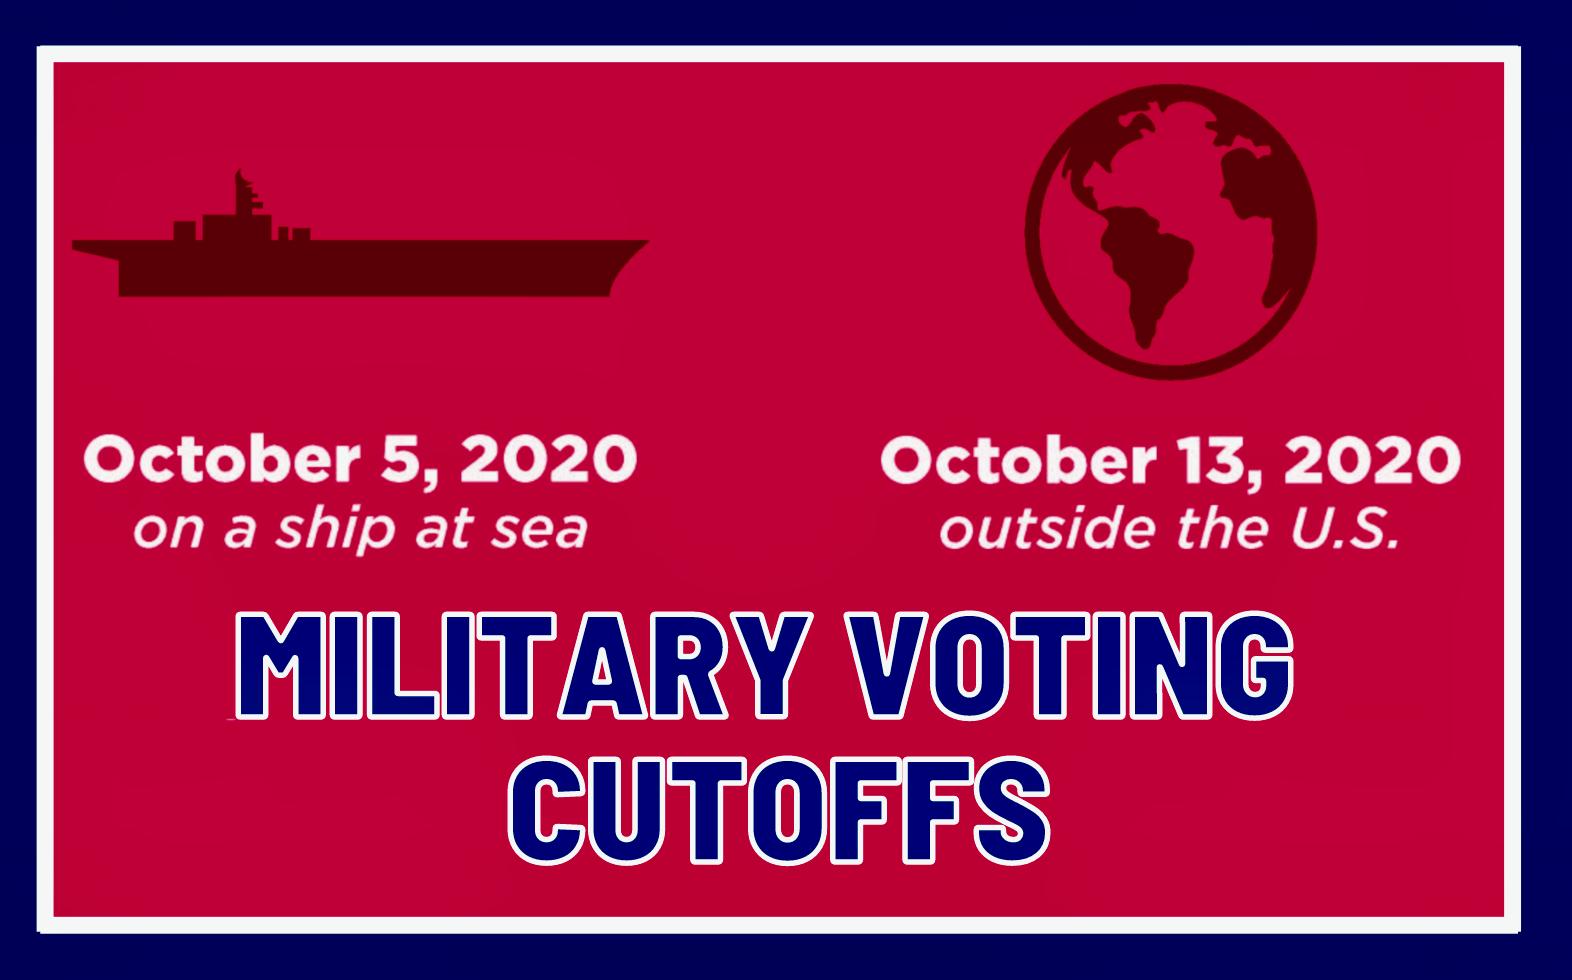 Military Voting Cutoffs!